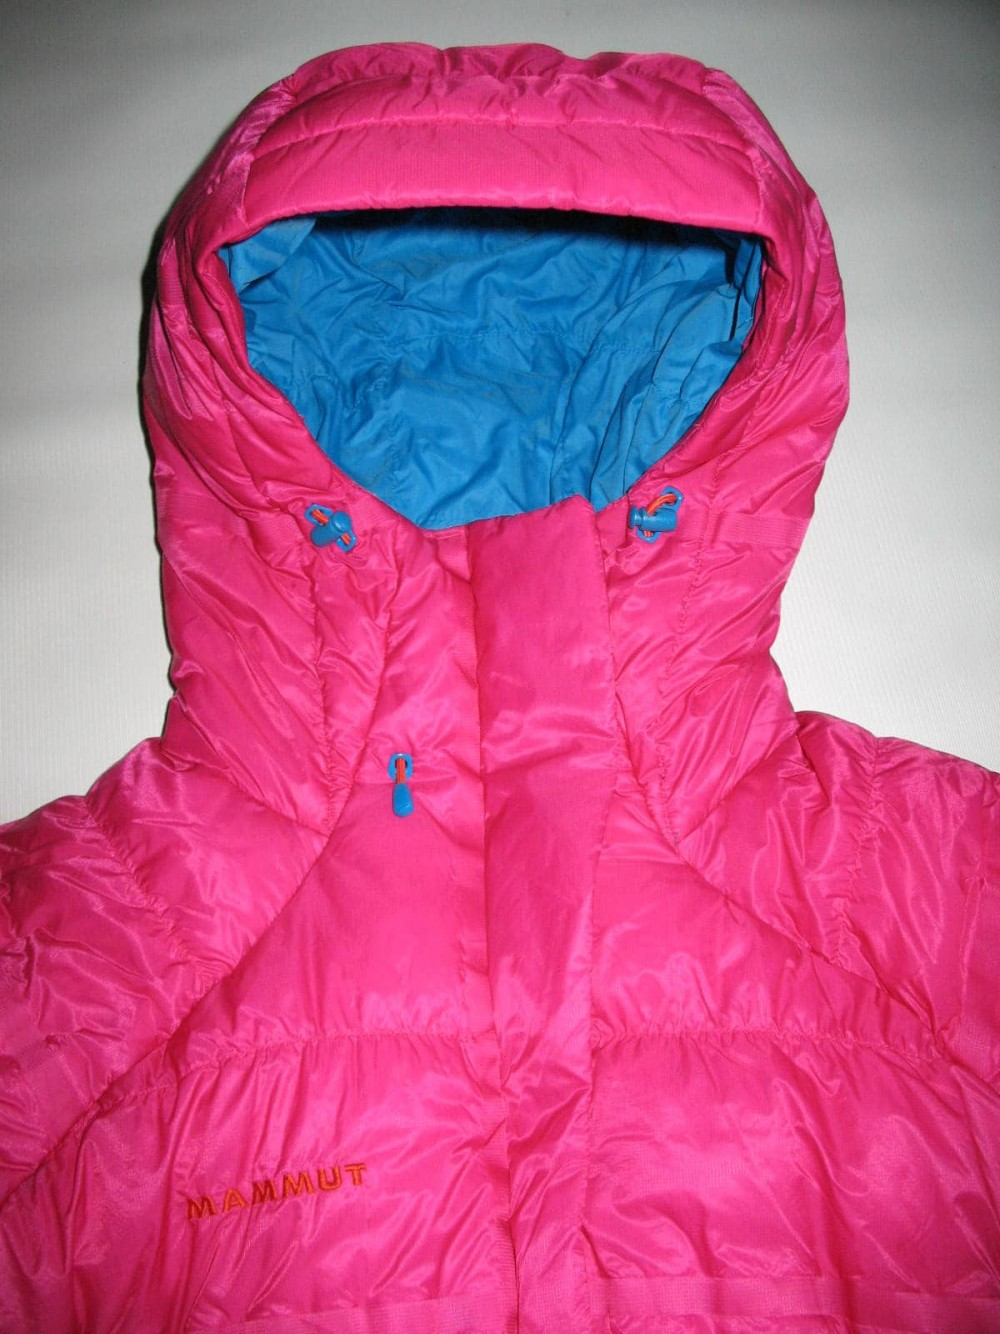 Куртка MAMMUT biwak eiger extreme jacket lady (размер S/M) - 4